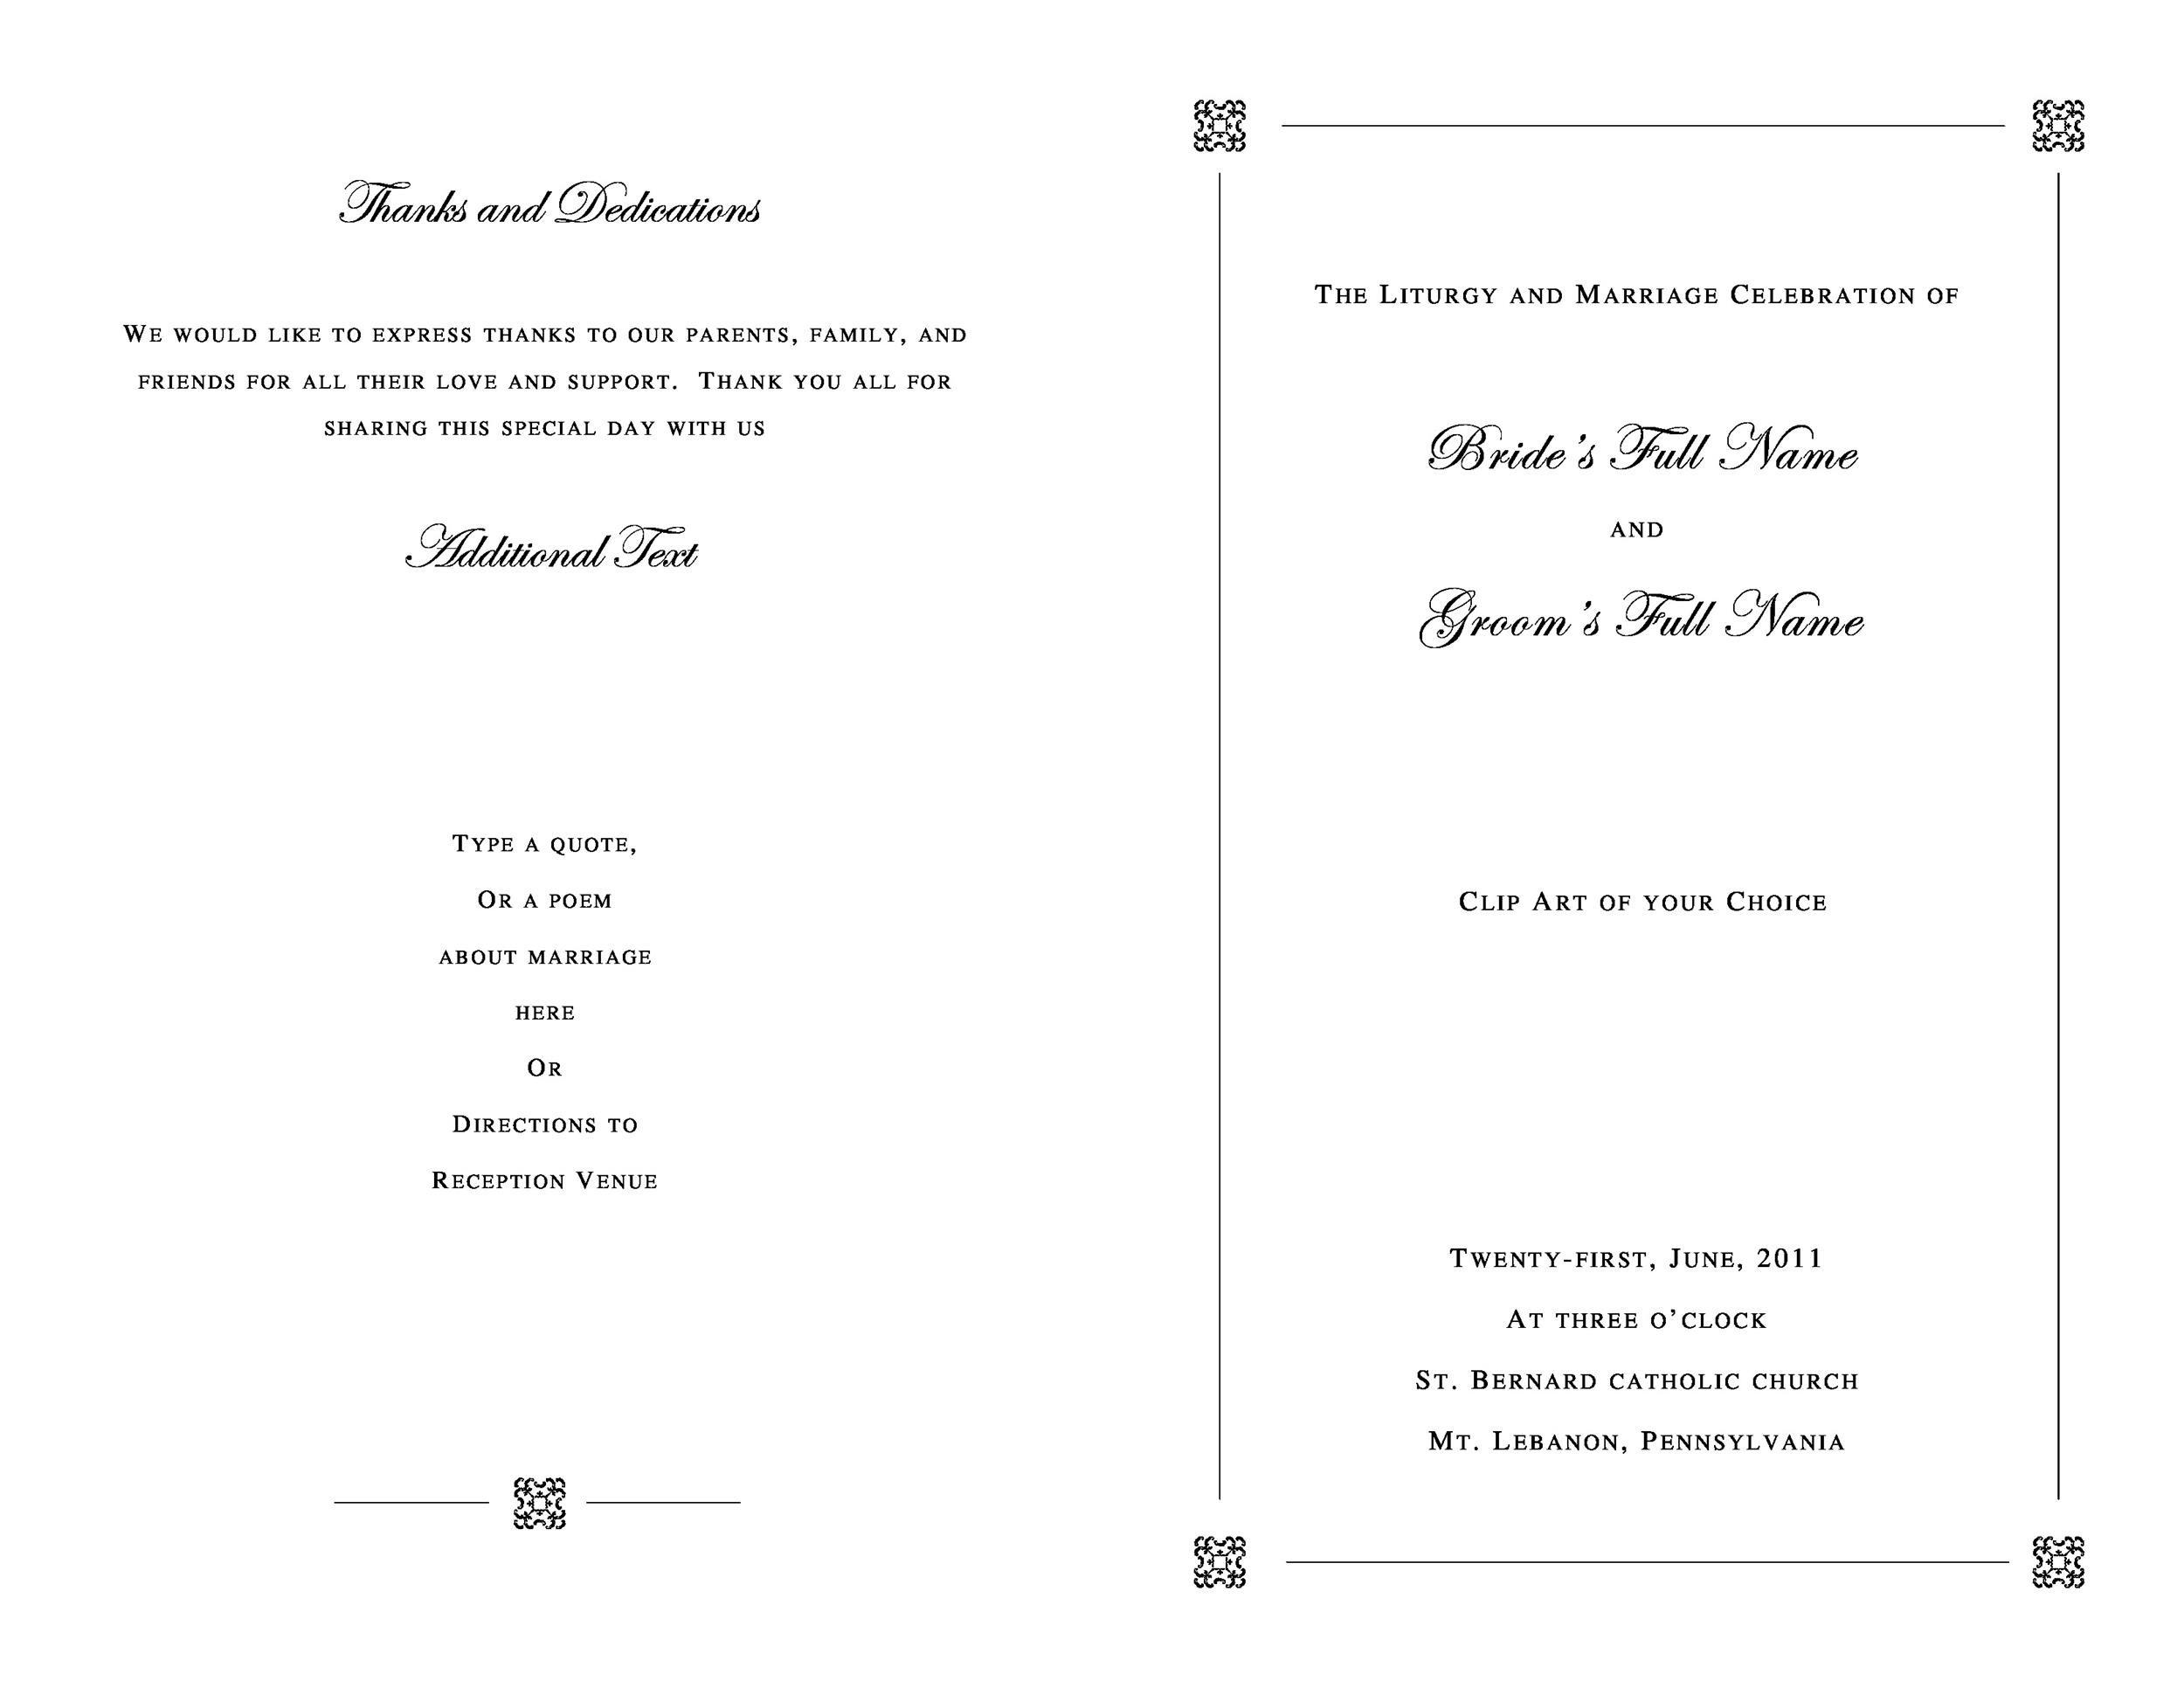 37 Printable Wedding Program Examples  Templates - Template Lab